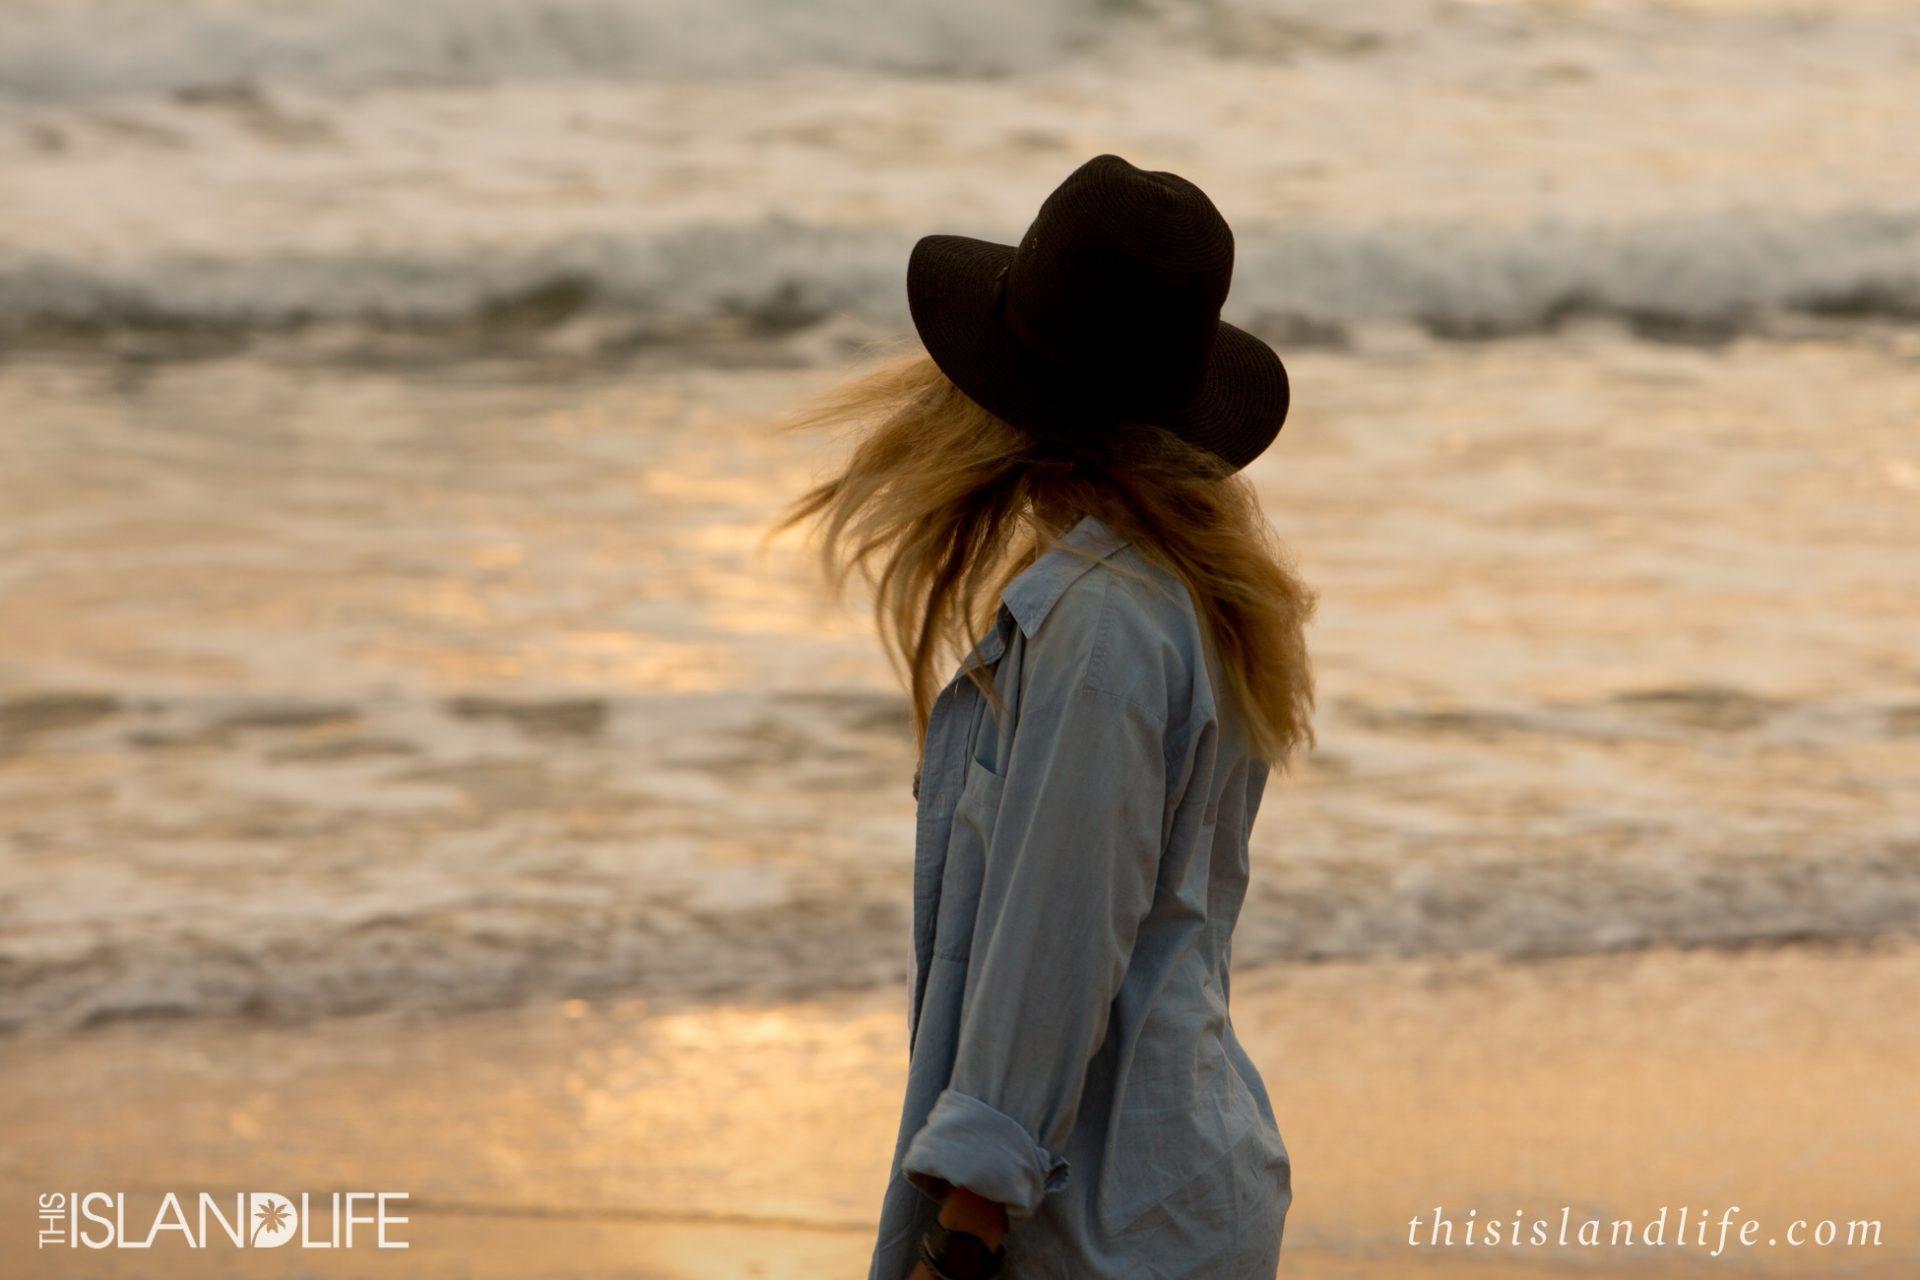 This island life & Michaela Skovranova for Queensland Tourism and Events